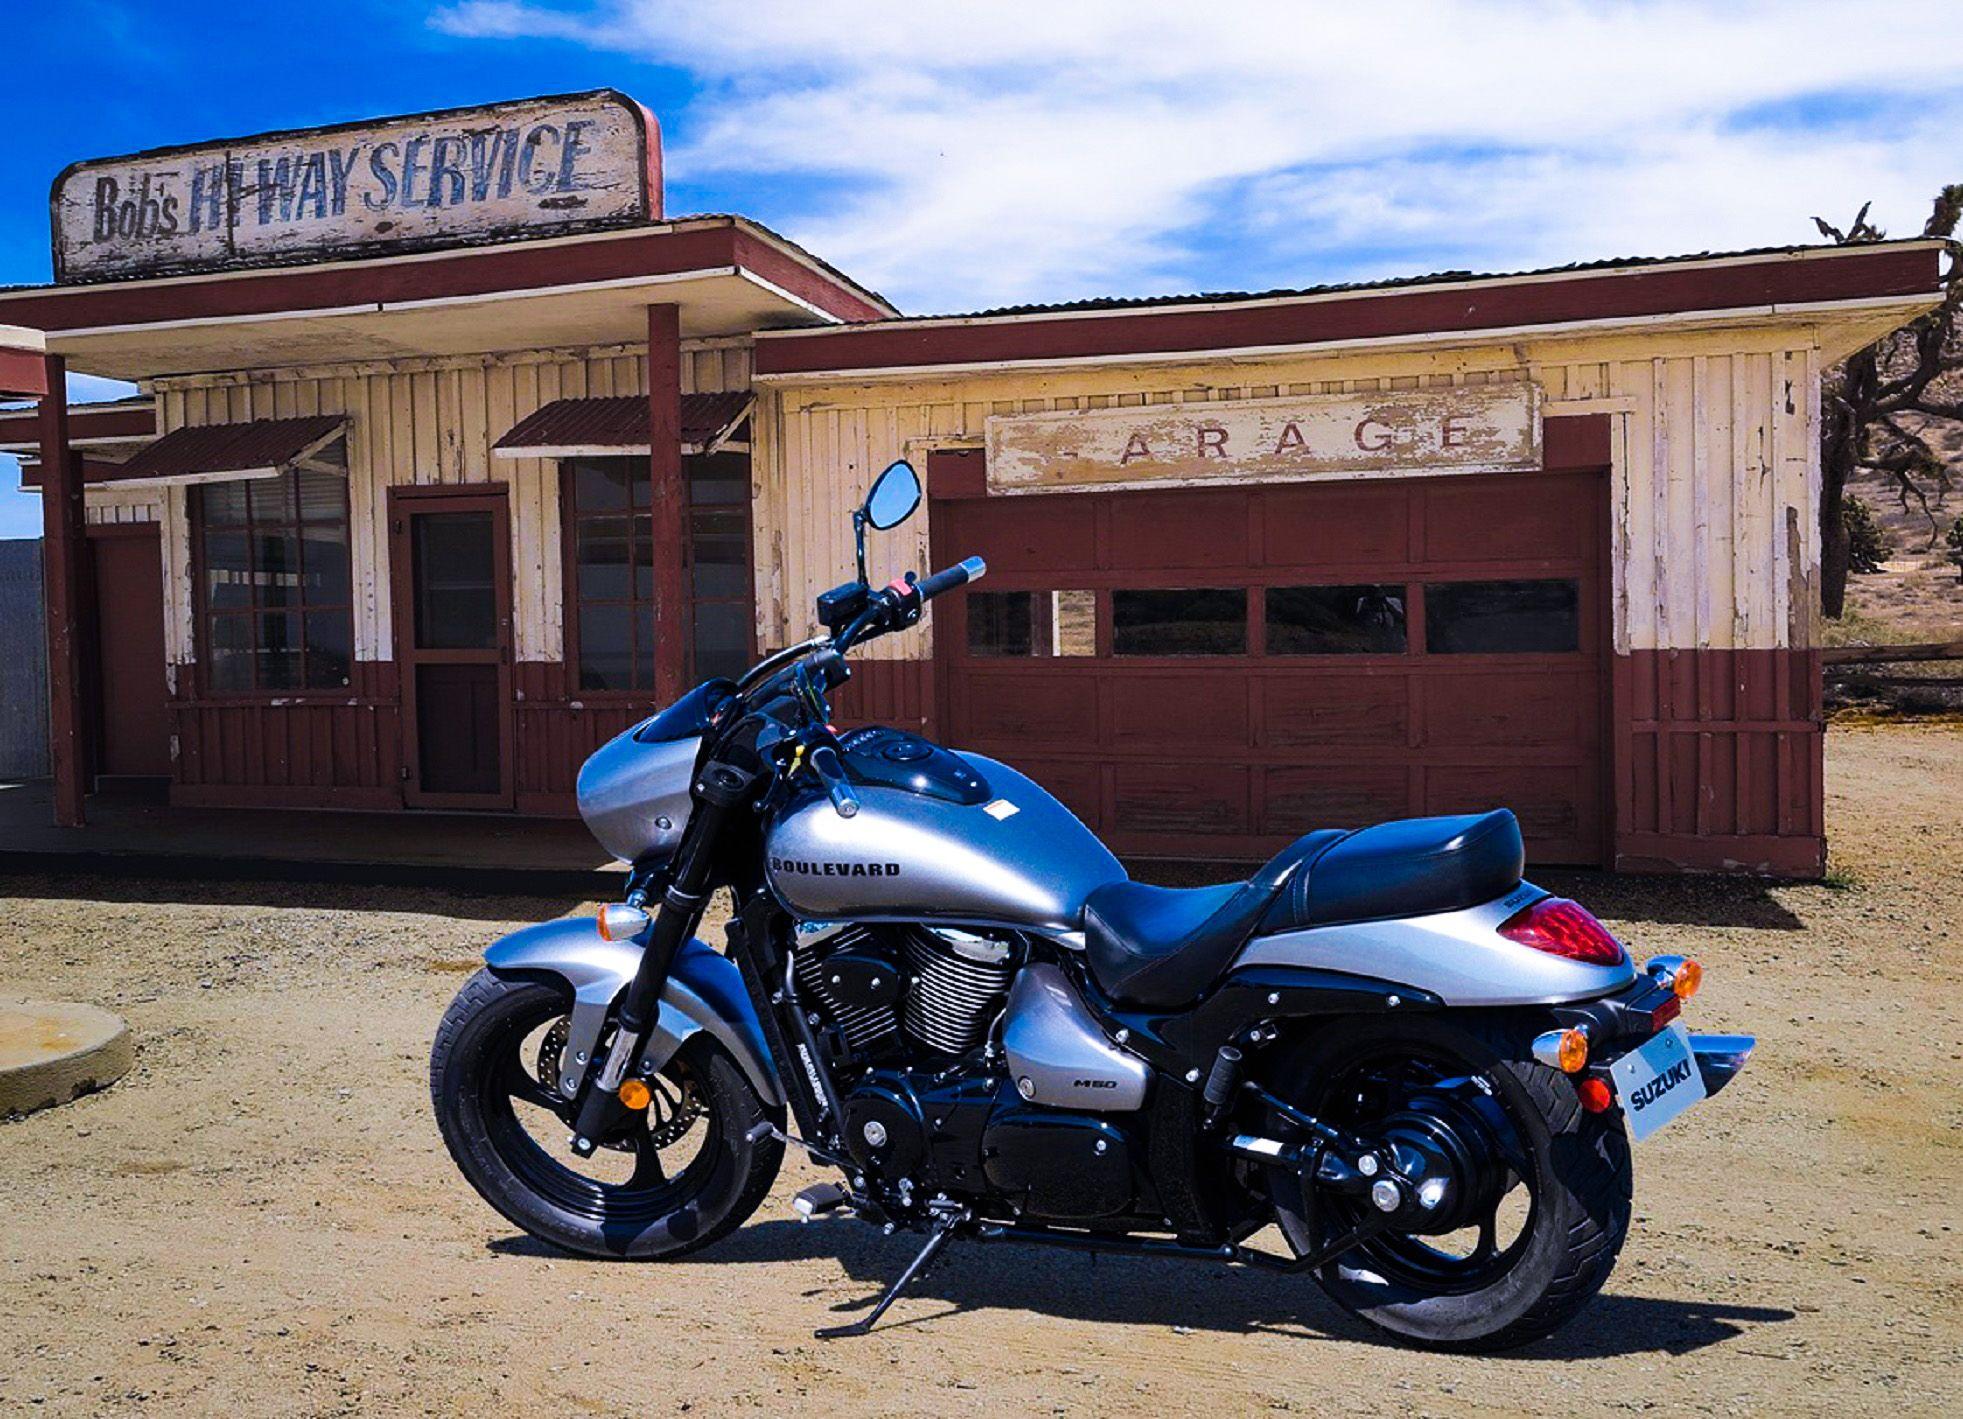 Suzuki c50 boss moto hd wallpaper motorcycles hd wallpaper pinterest hd wallpaper